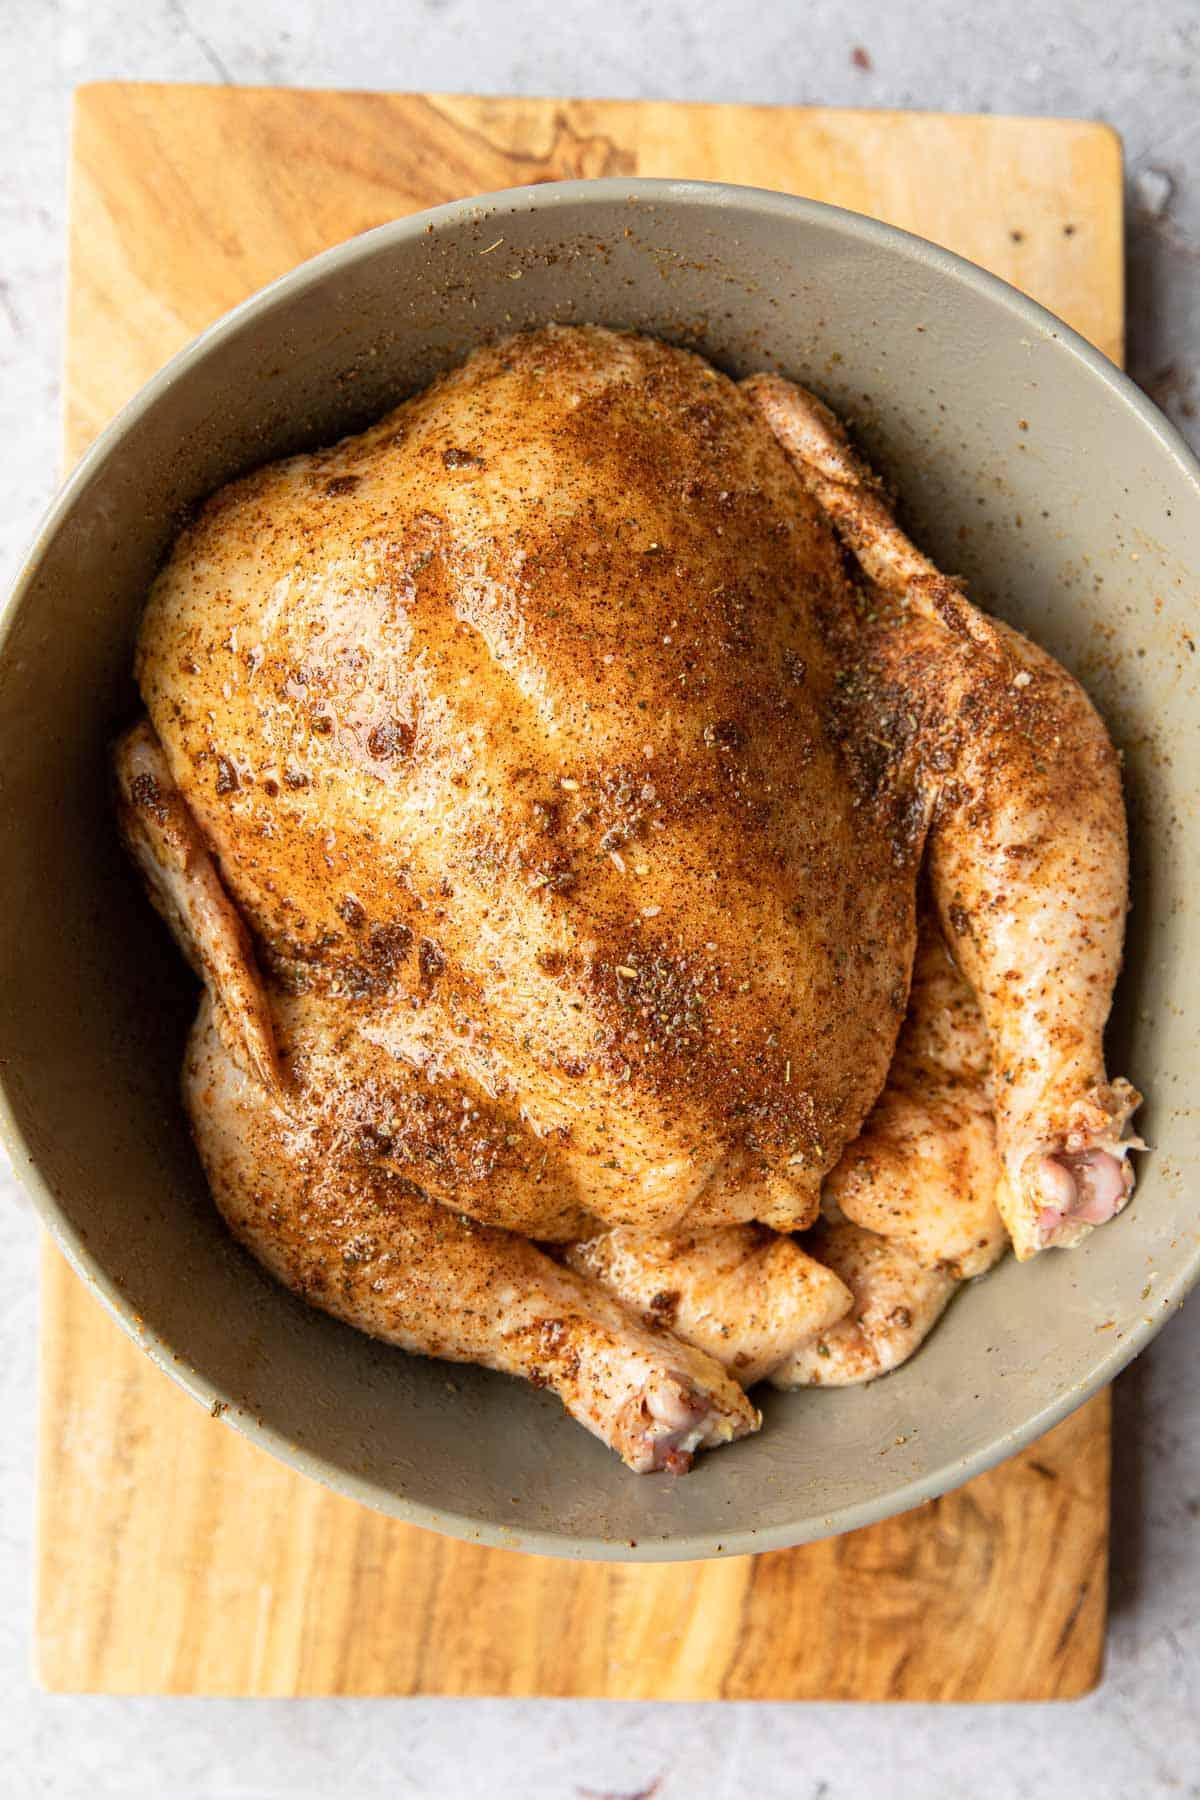 raw seasoned whole chicken